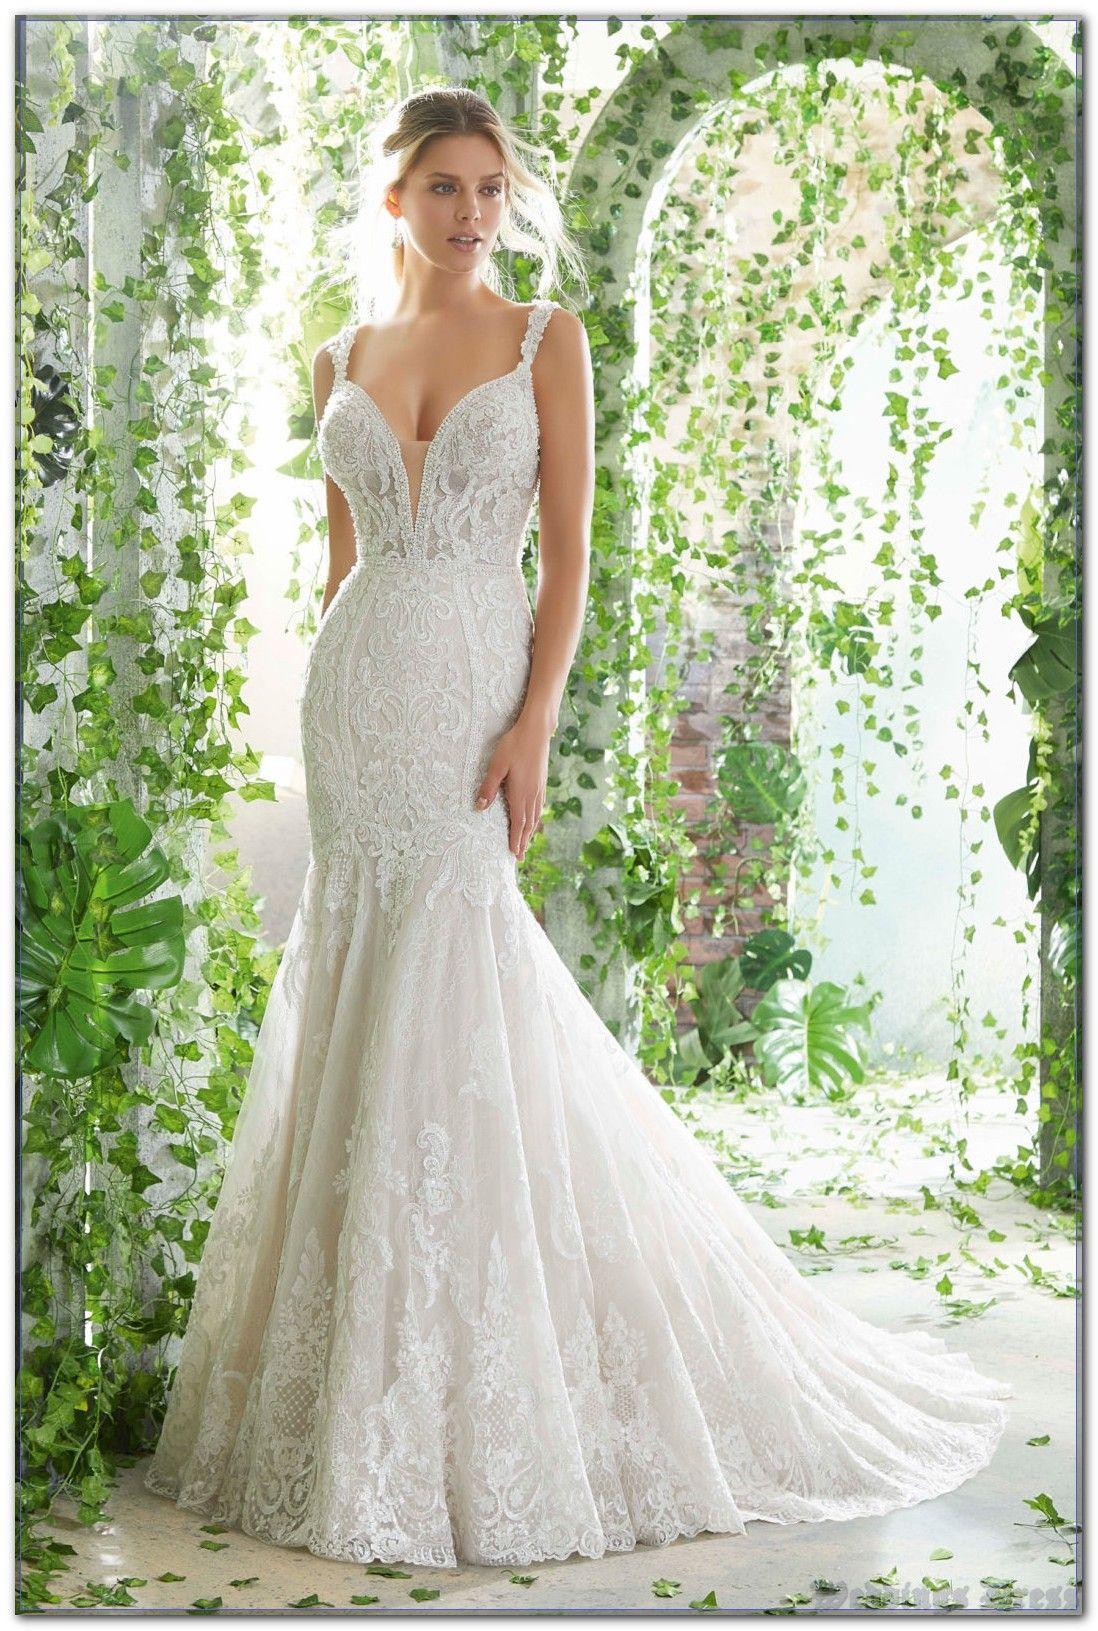 Winning Tactics For Weddings Dress